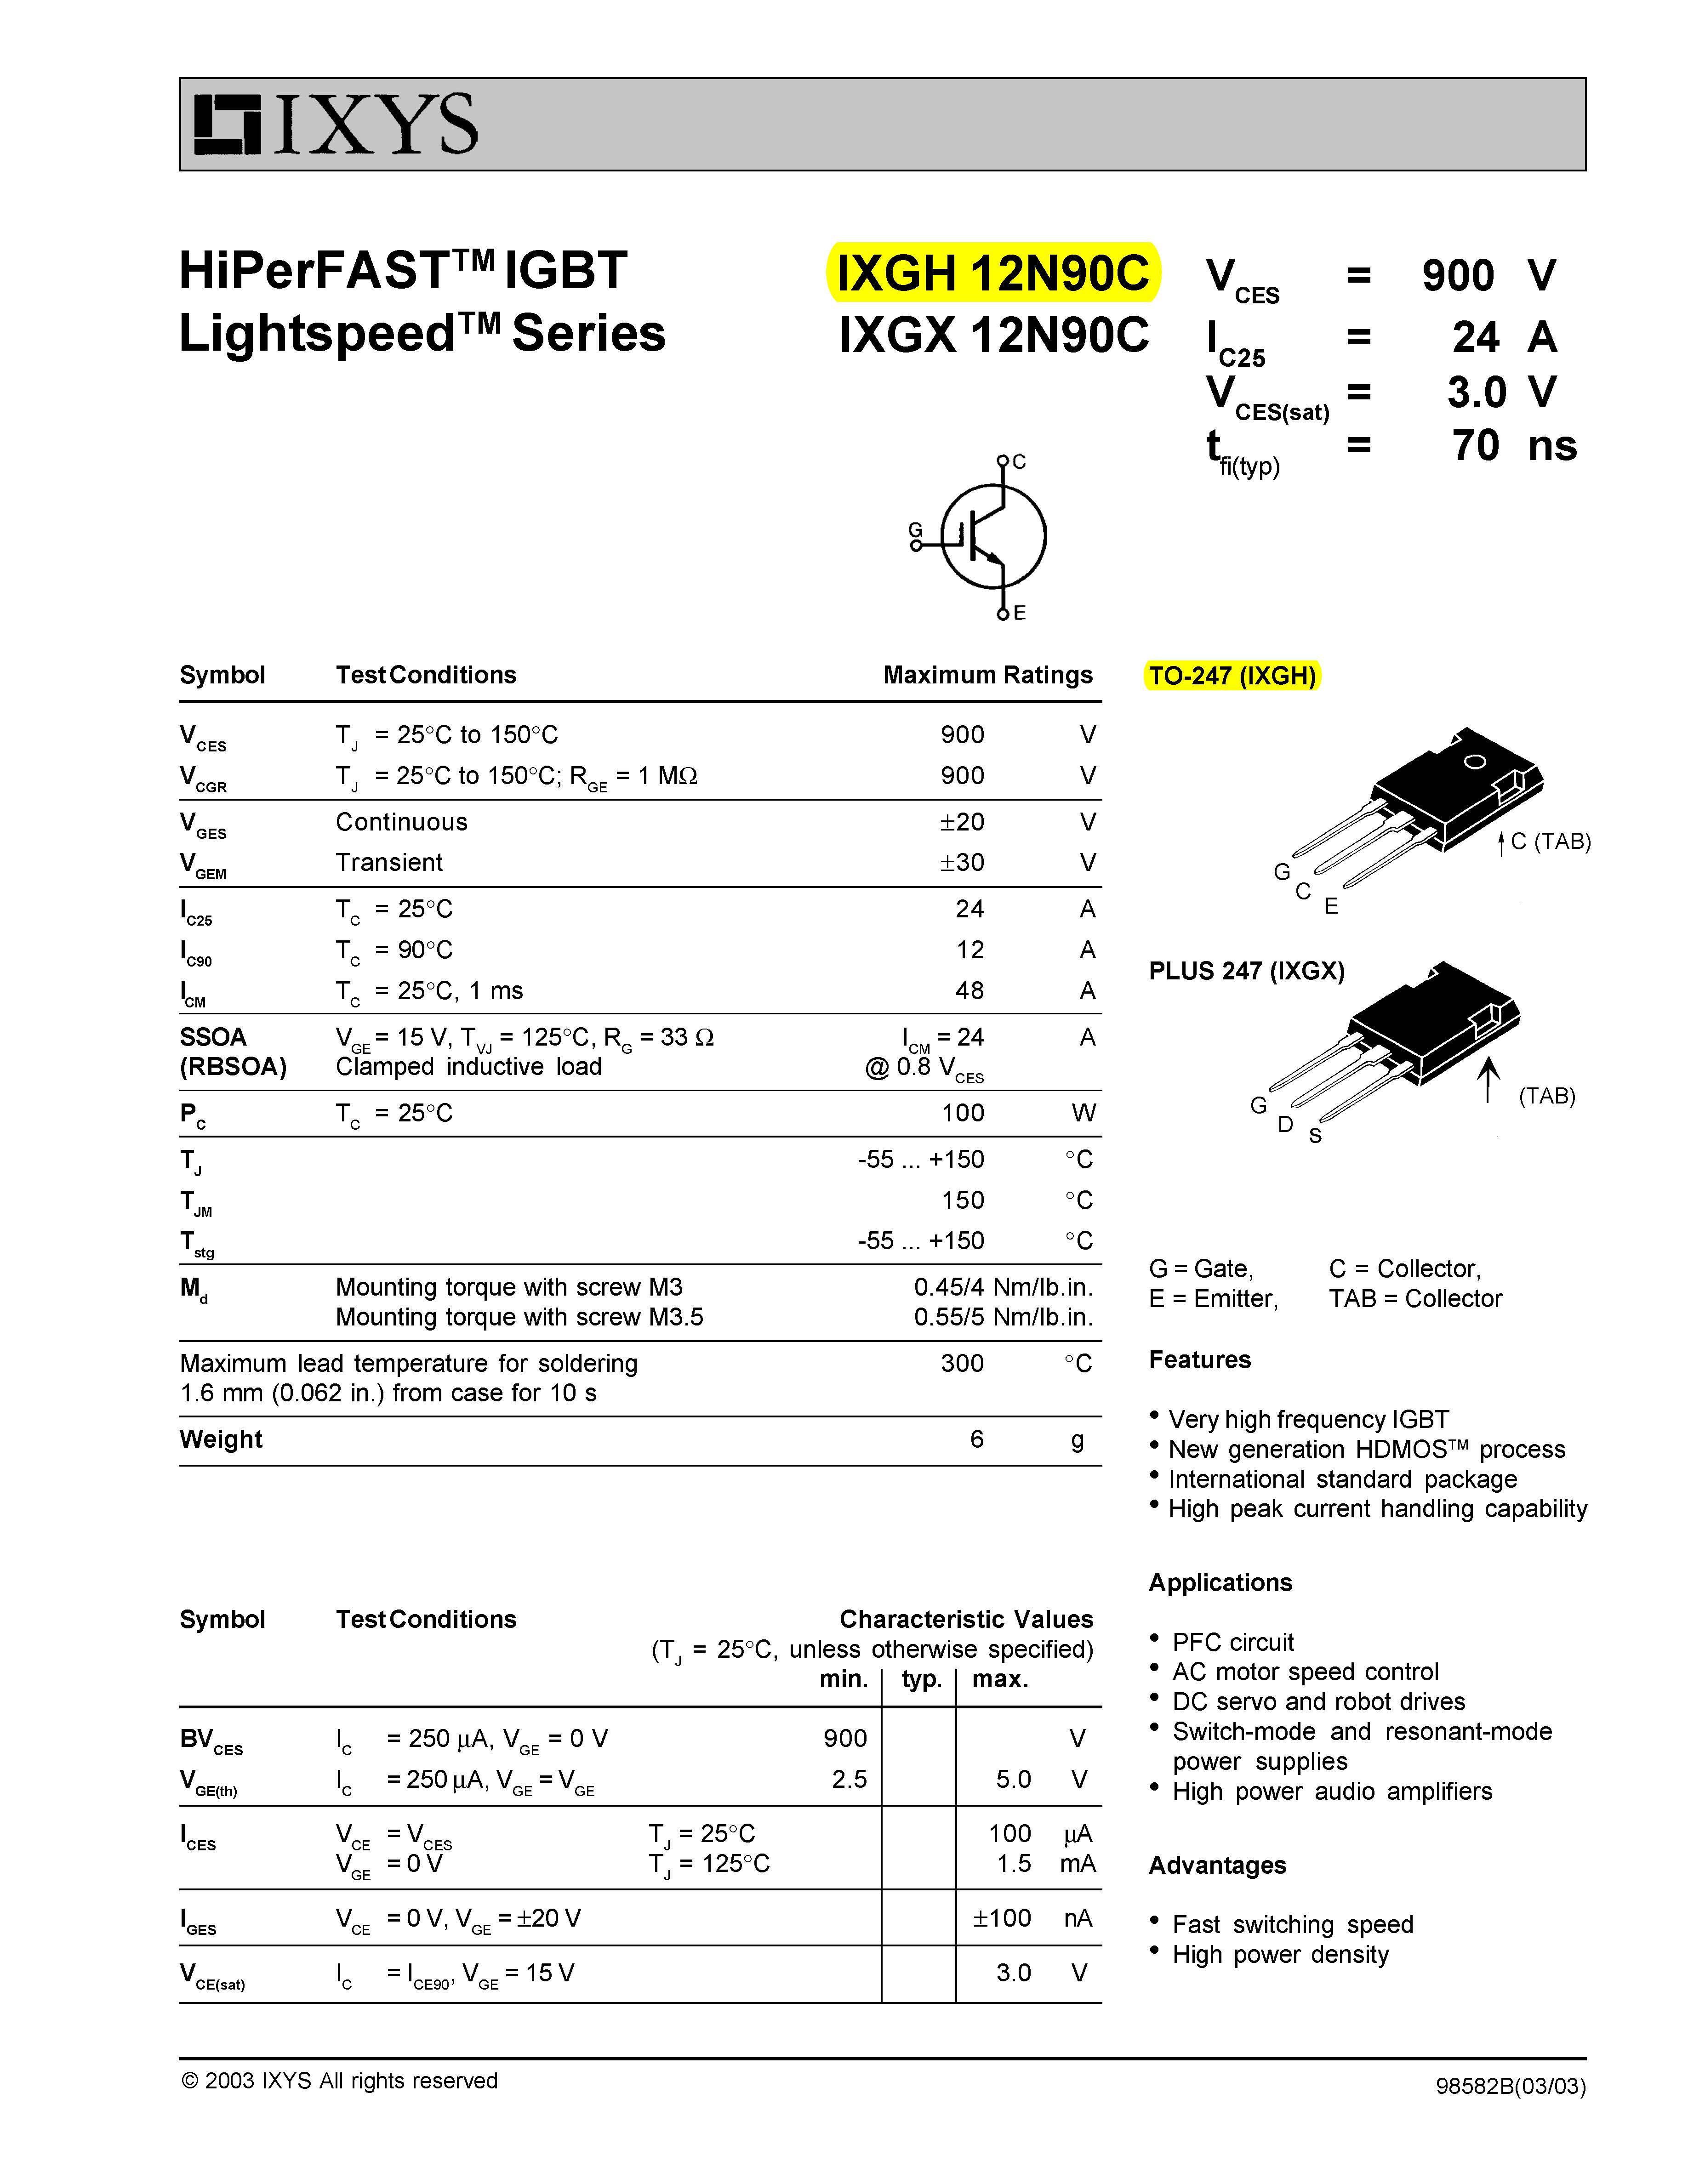 ixgh12n90c-page-1.jpg